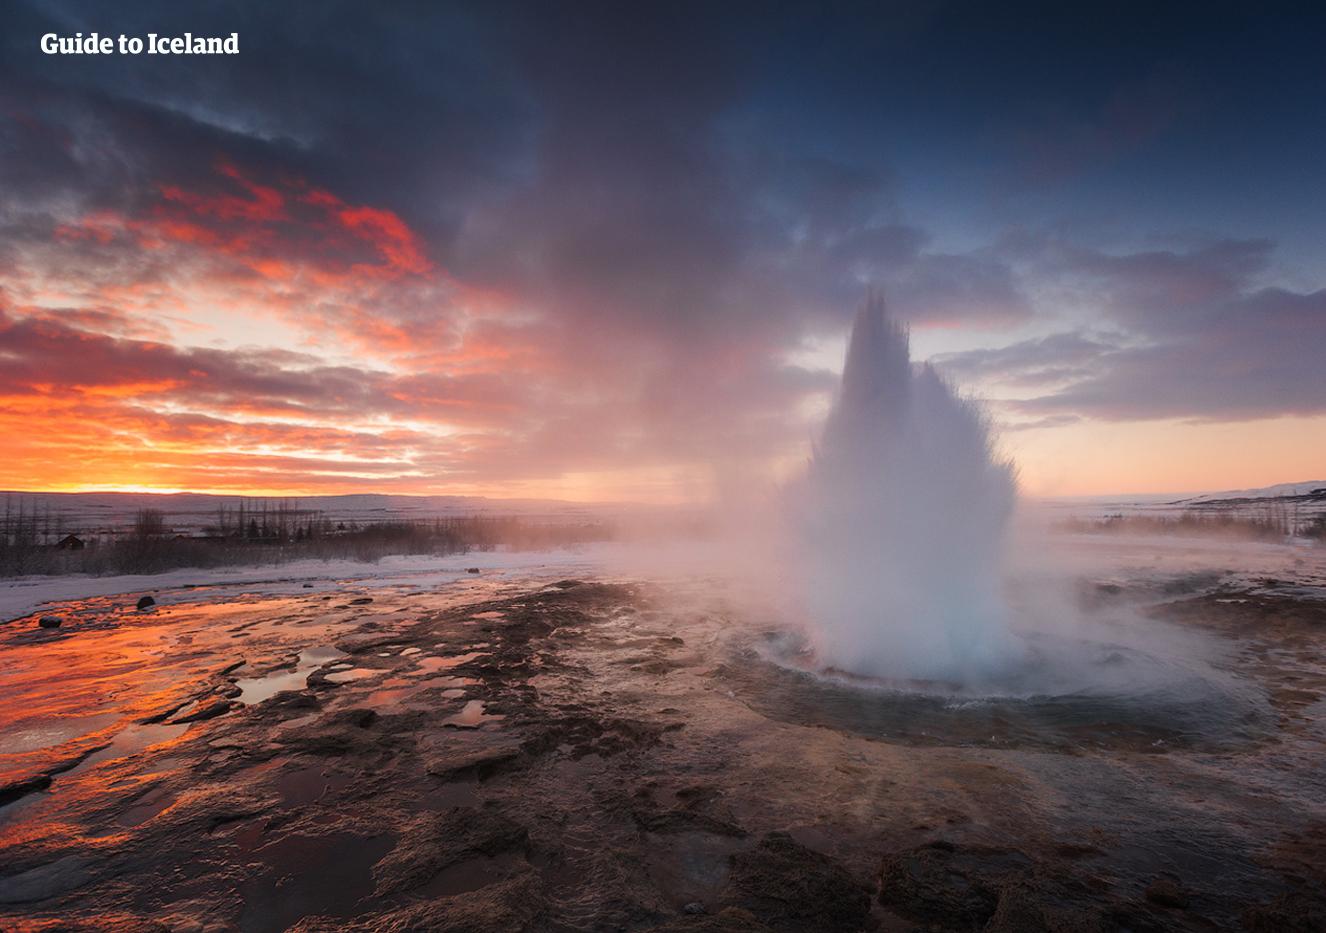 Strokkur, Iceland's most active geyser, begins one of its regular eruptions.